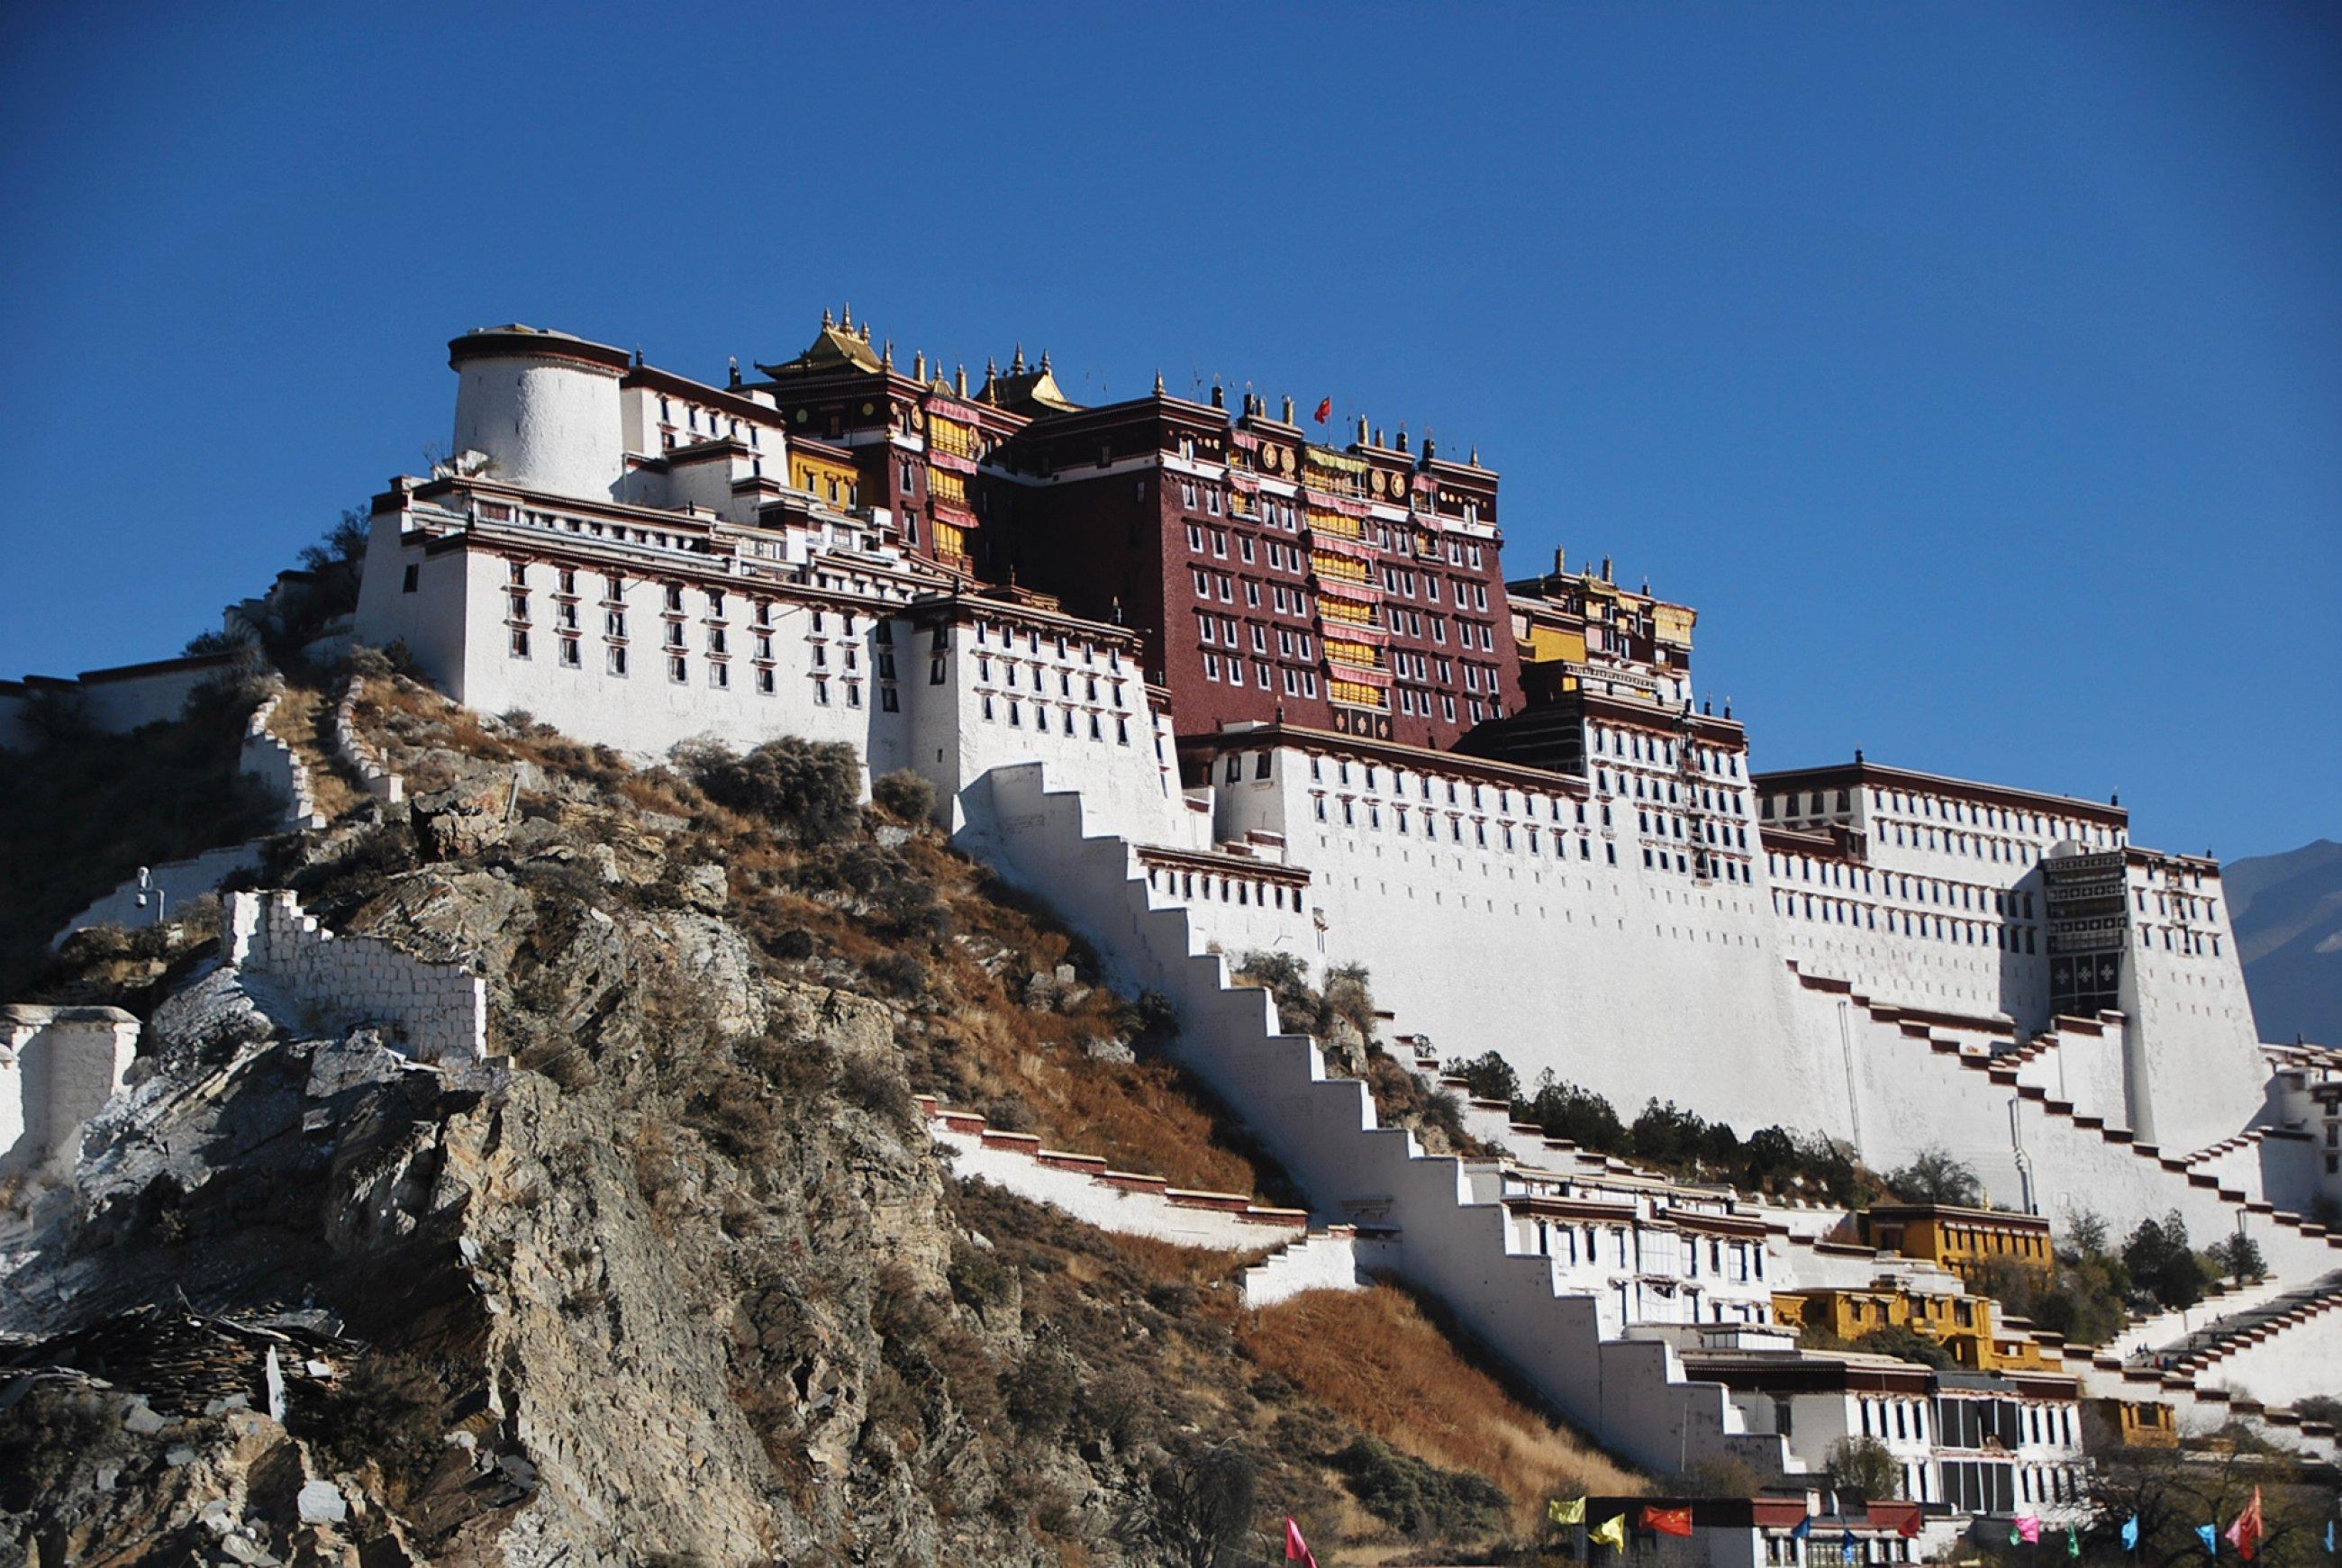 https://bubo.sk/uploads/galleries/16319/tibet-potala-ctni-11-2014-mirka-sulka-157-.jpg